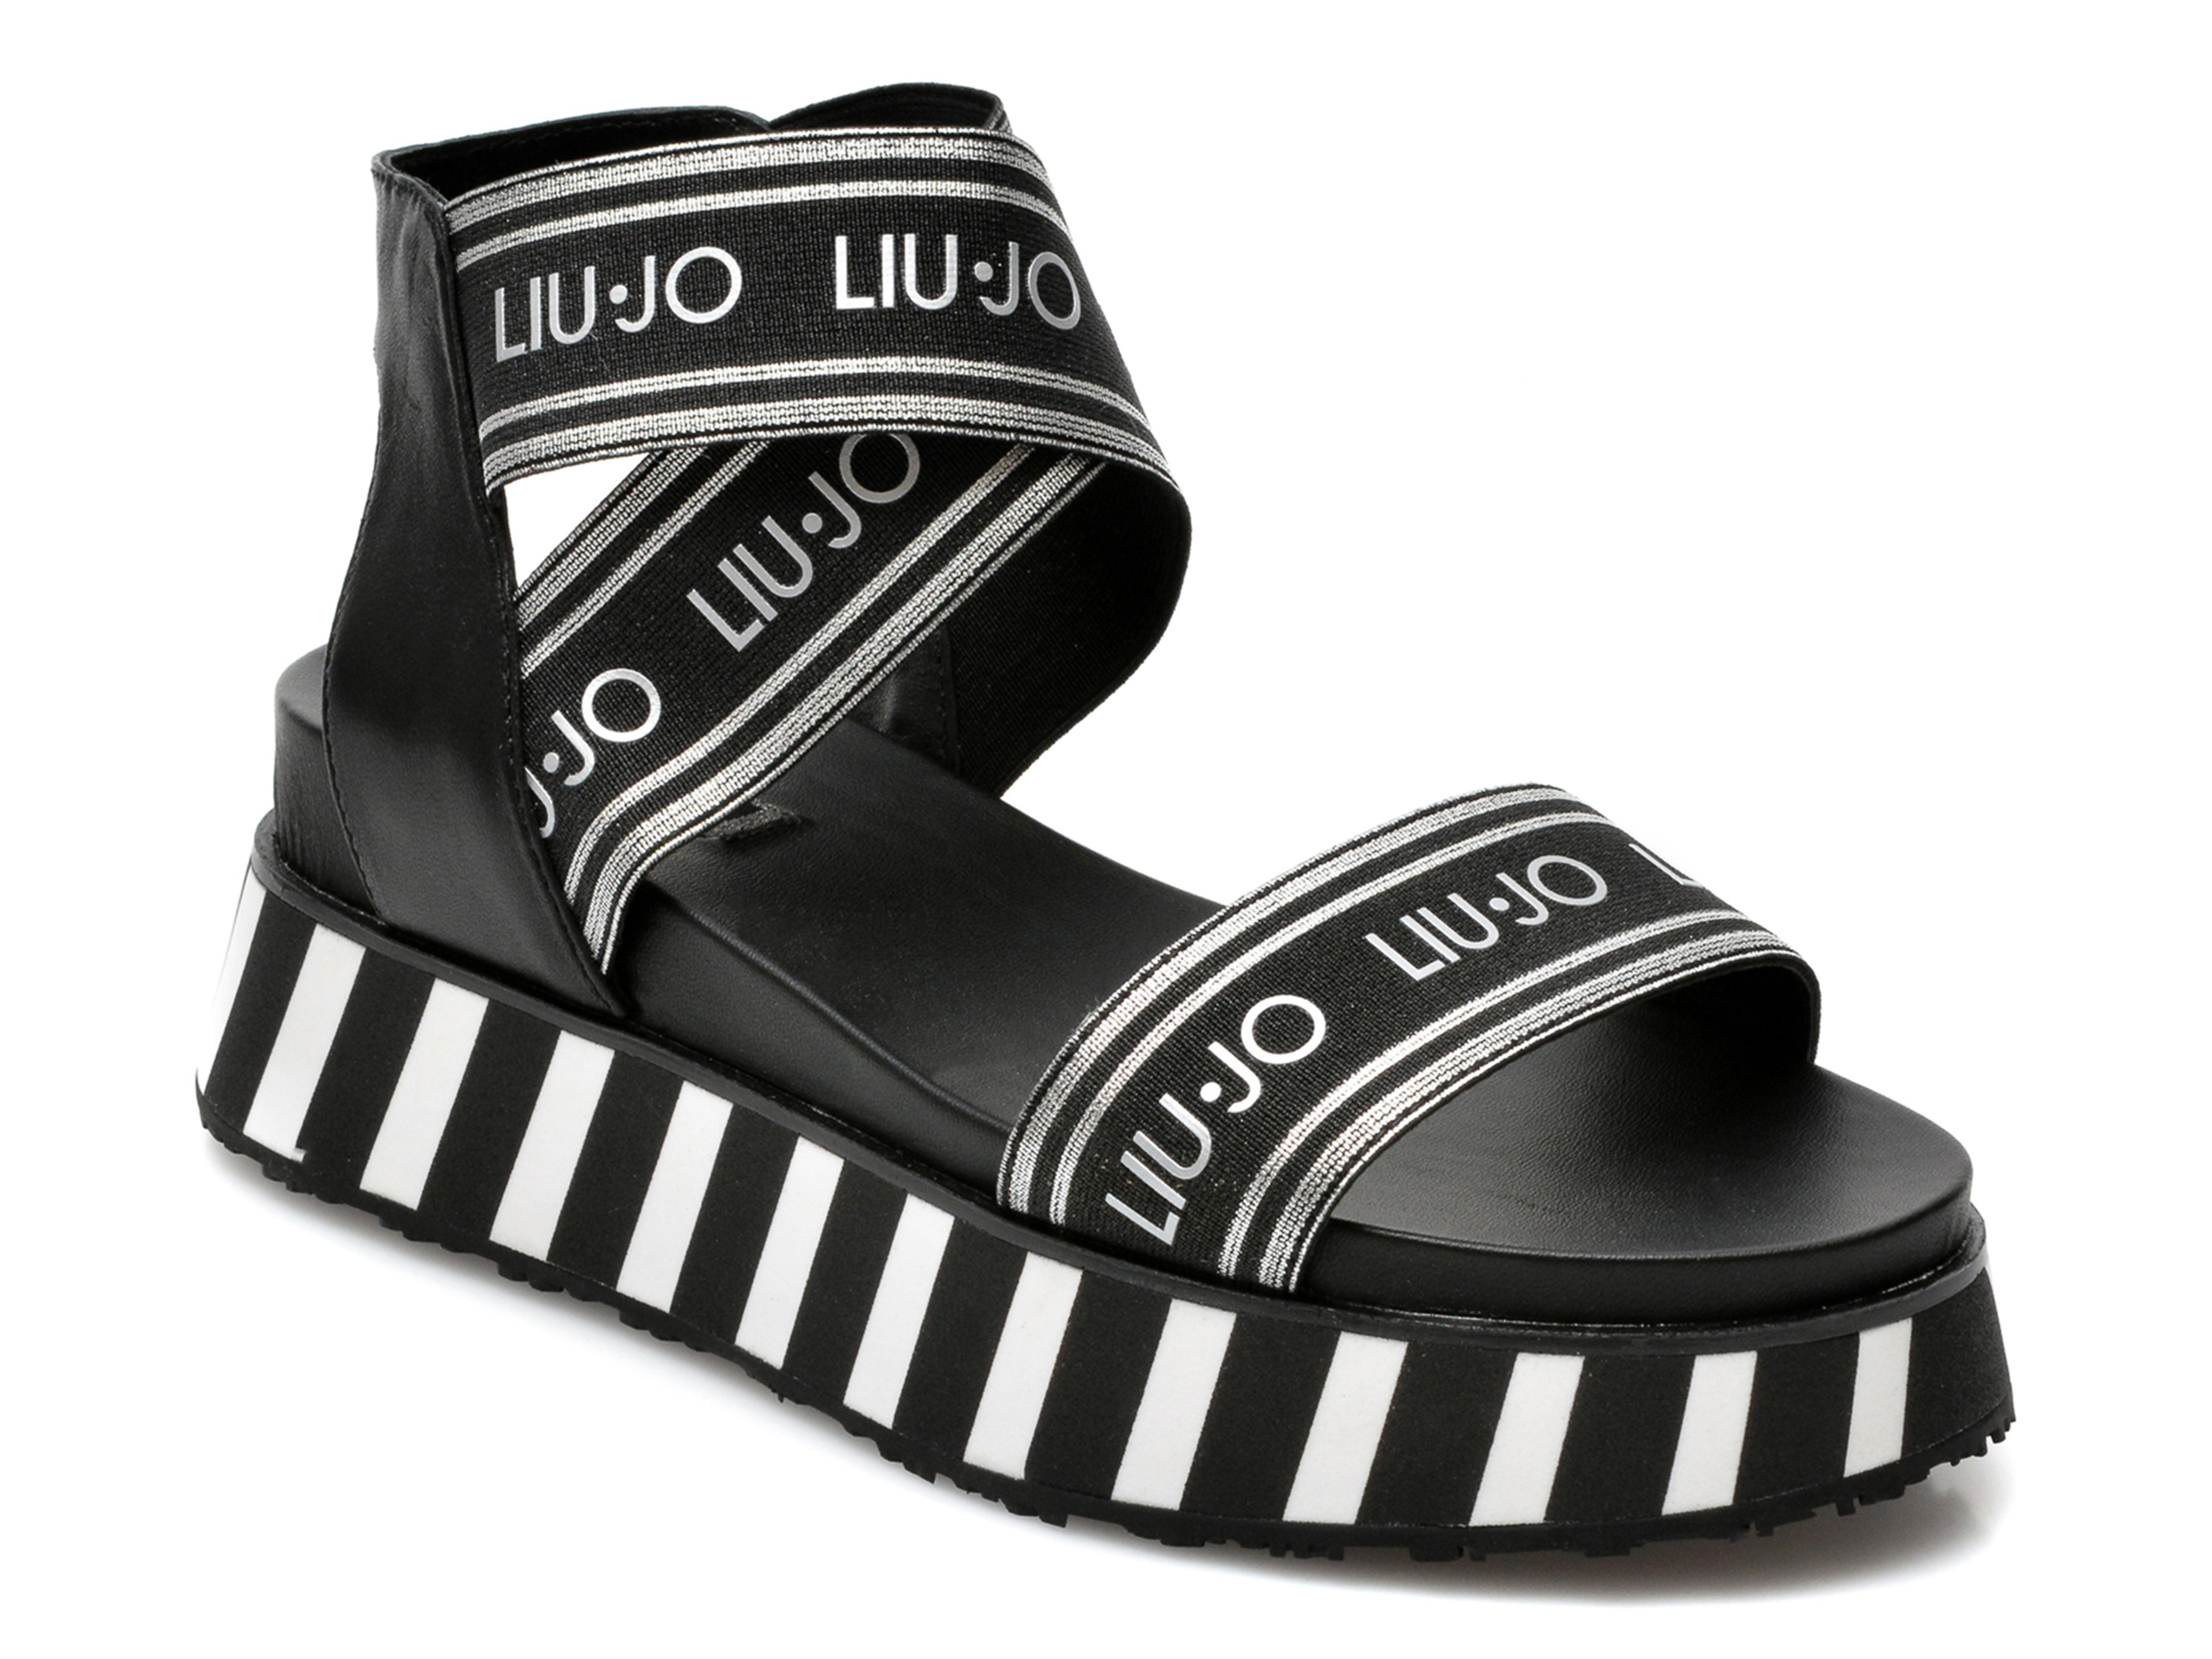 Sandale LIU JO negre, Frida 1, din material textil si piele naturala